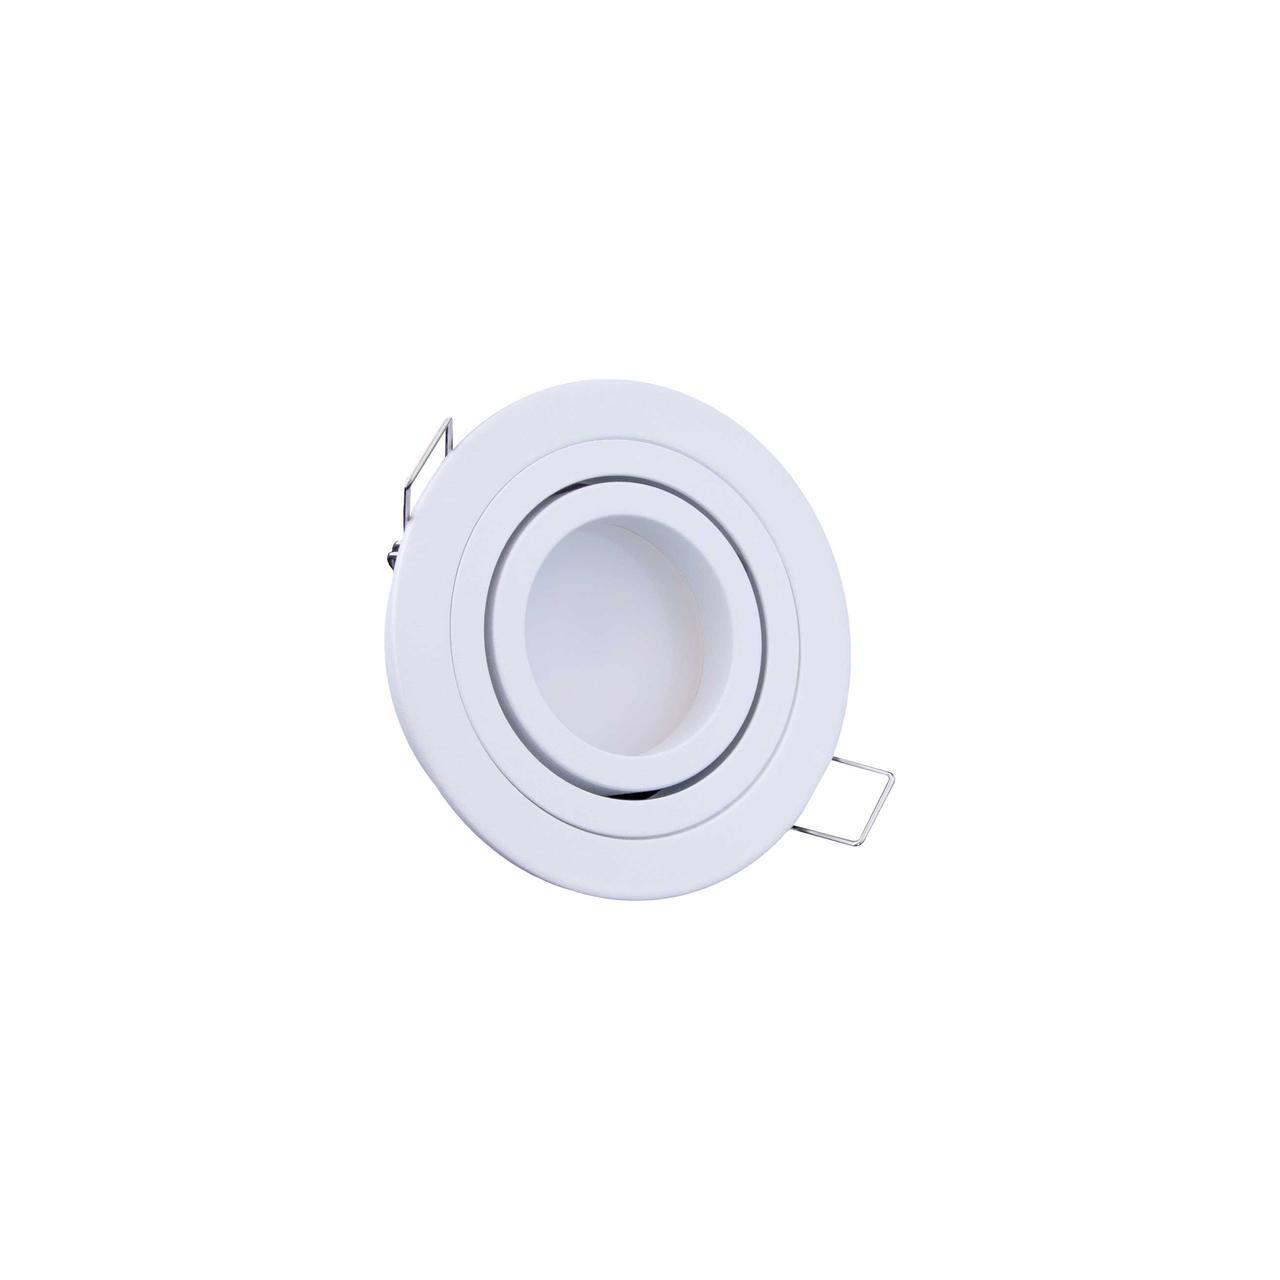 Точечный светильник Skarlat TH5808 WH